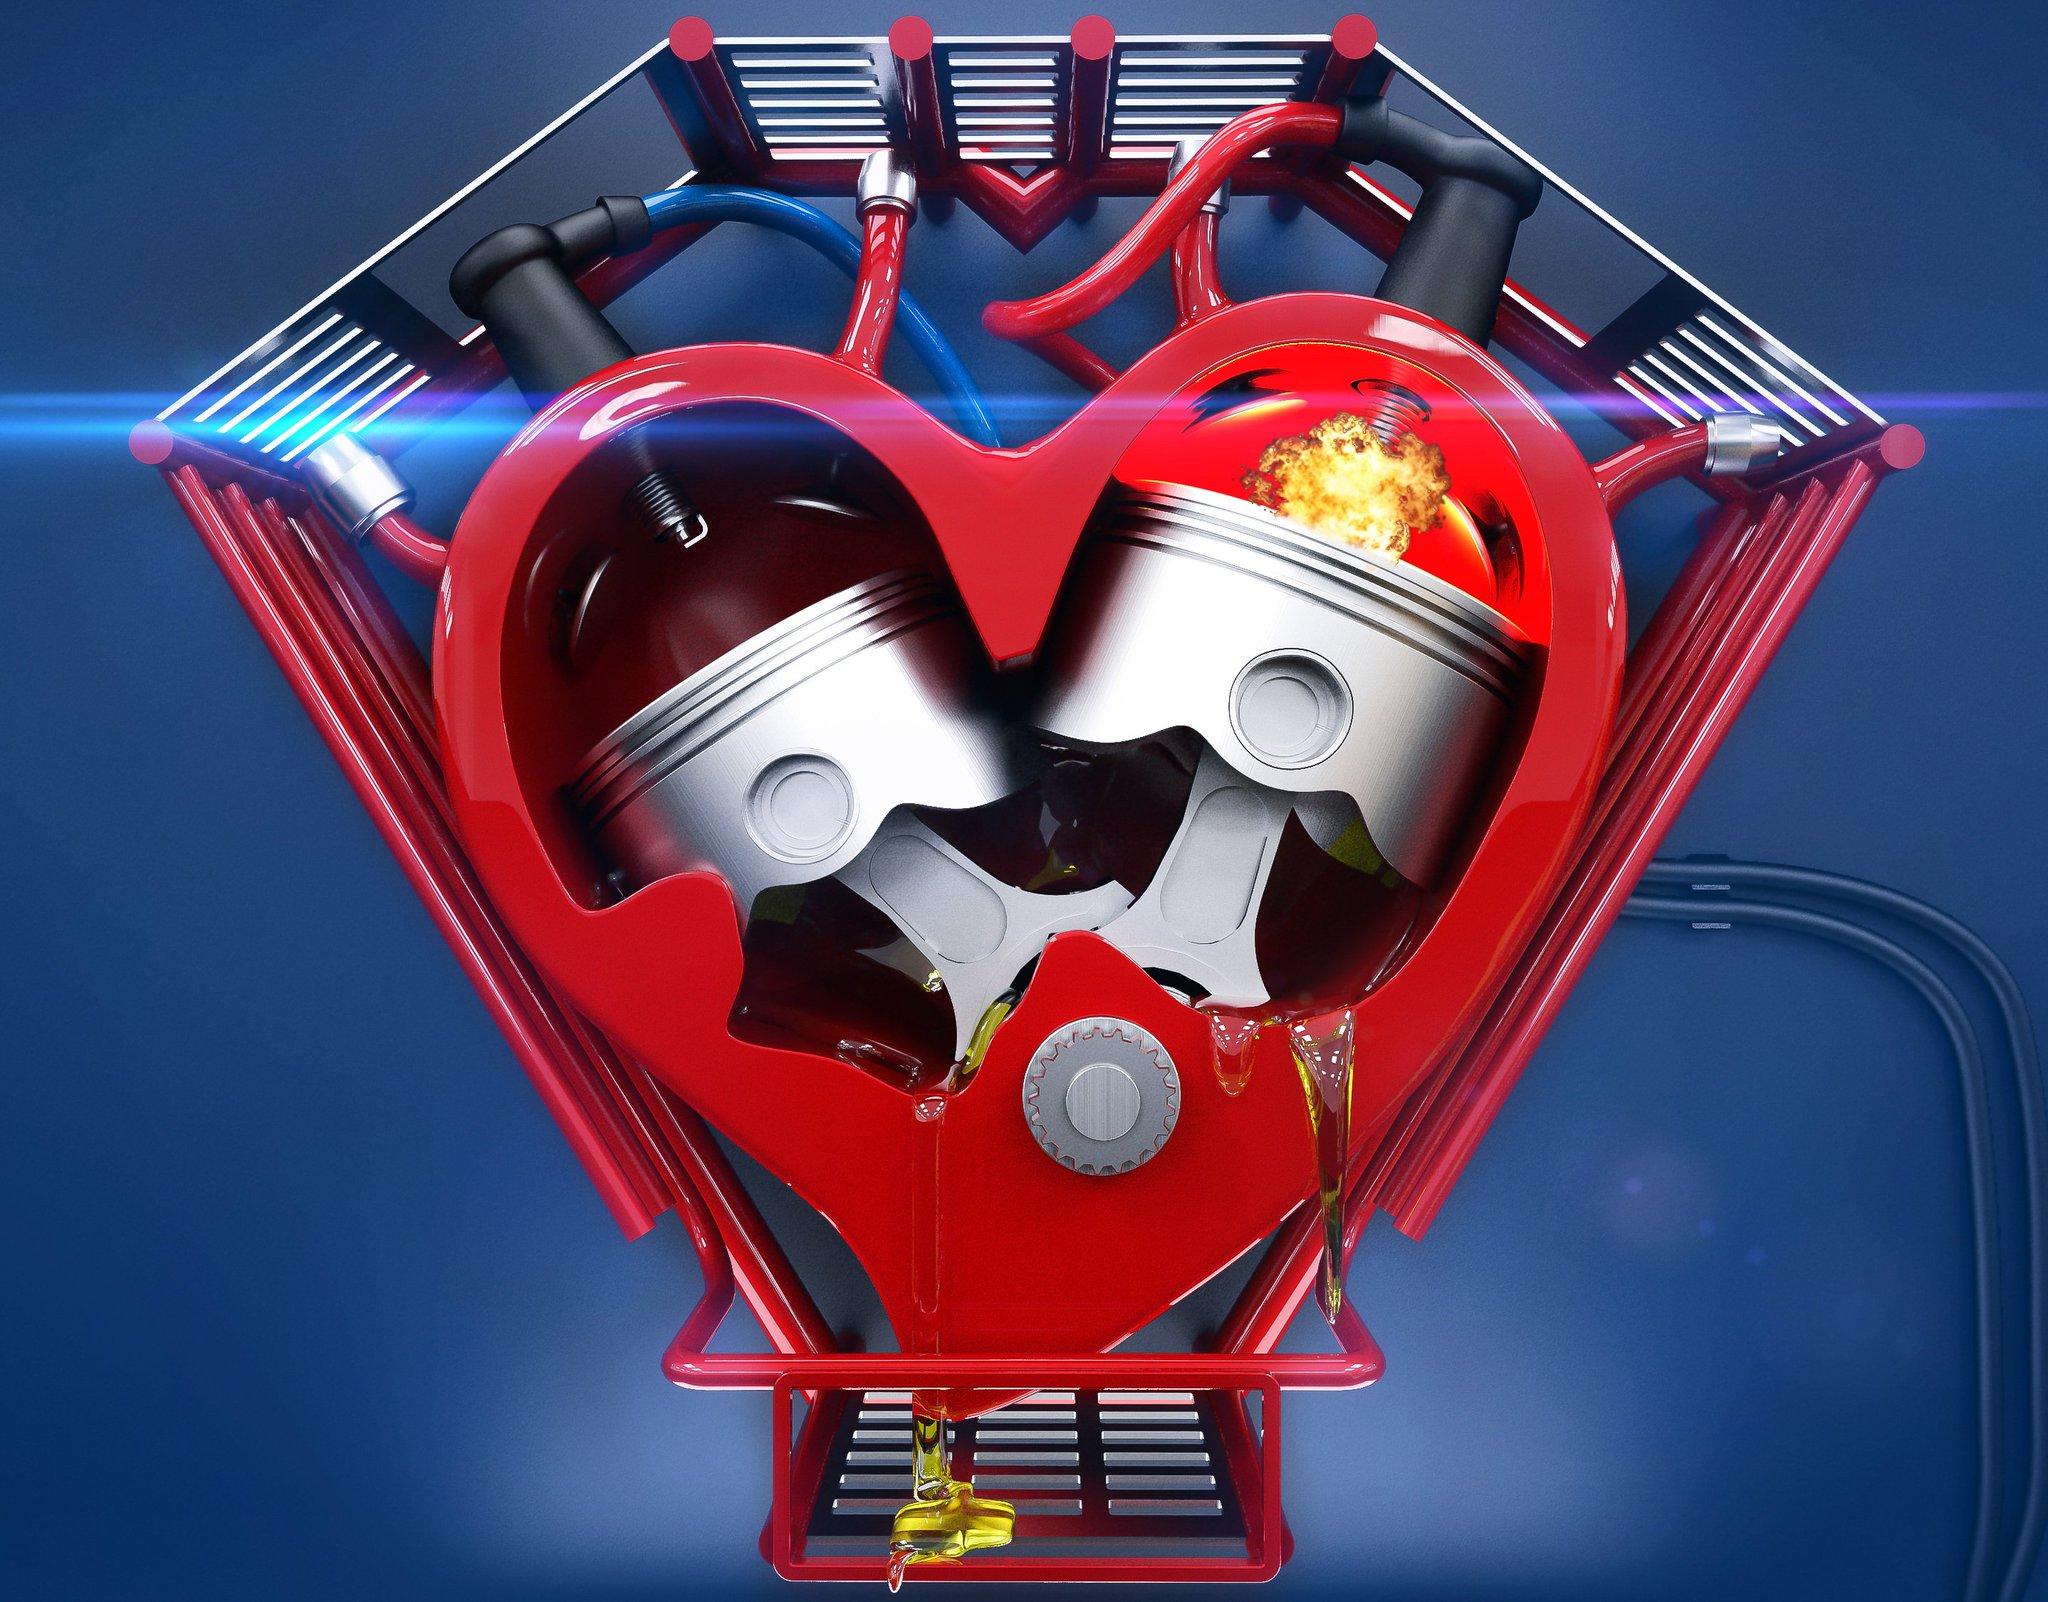 картинки сердце с мотором экспортировал